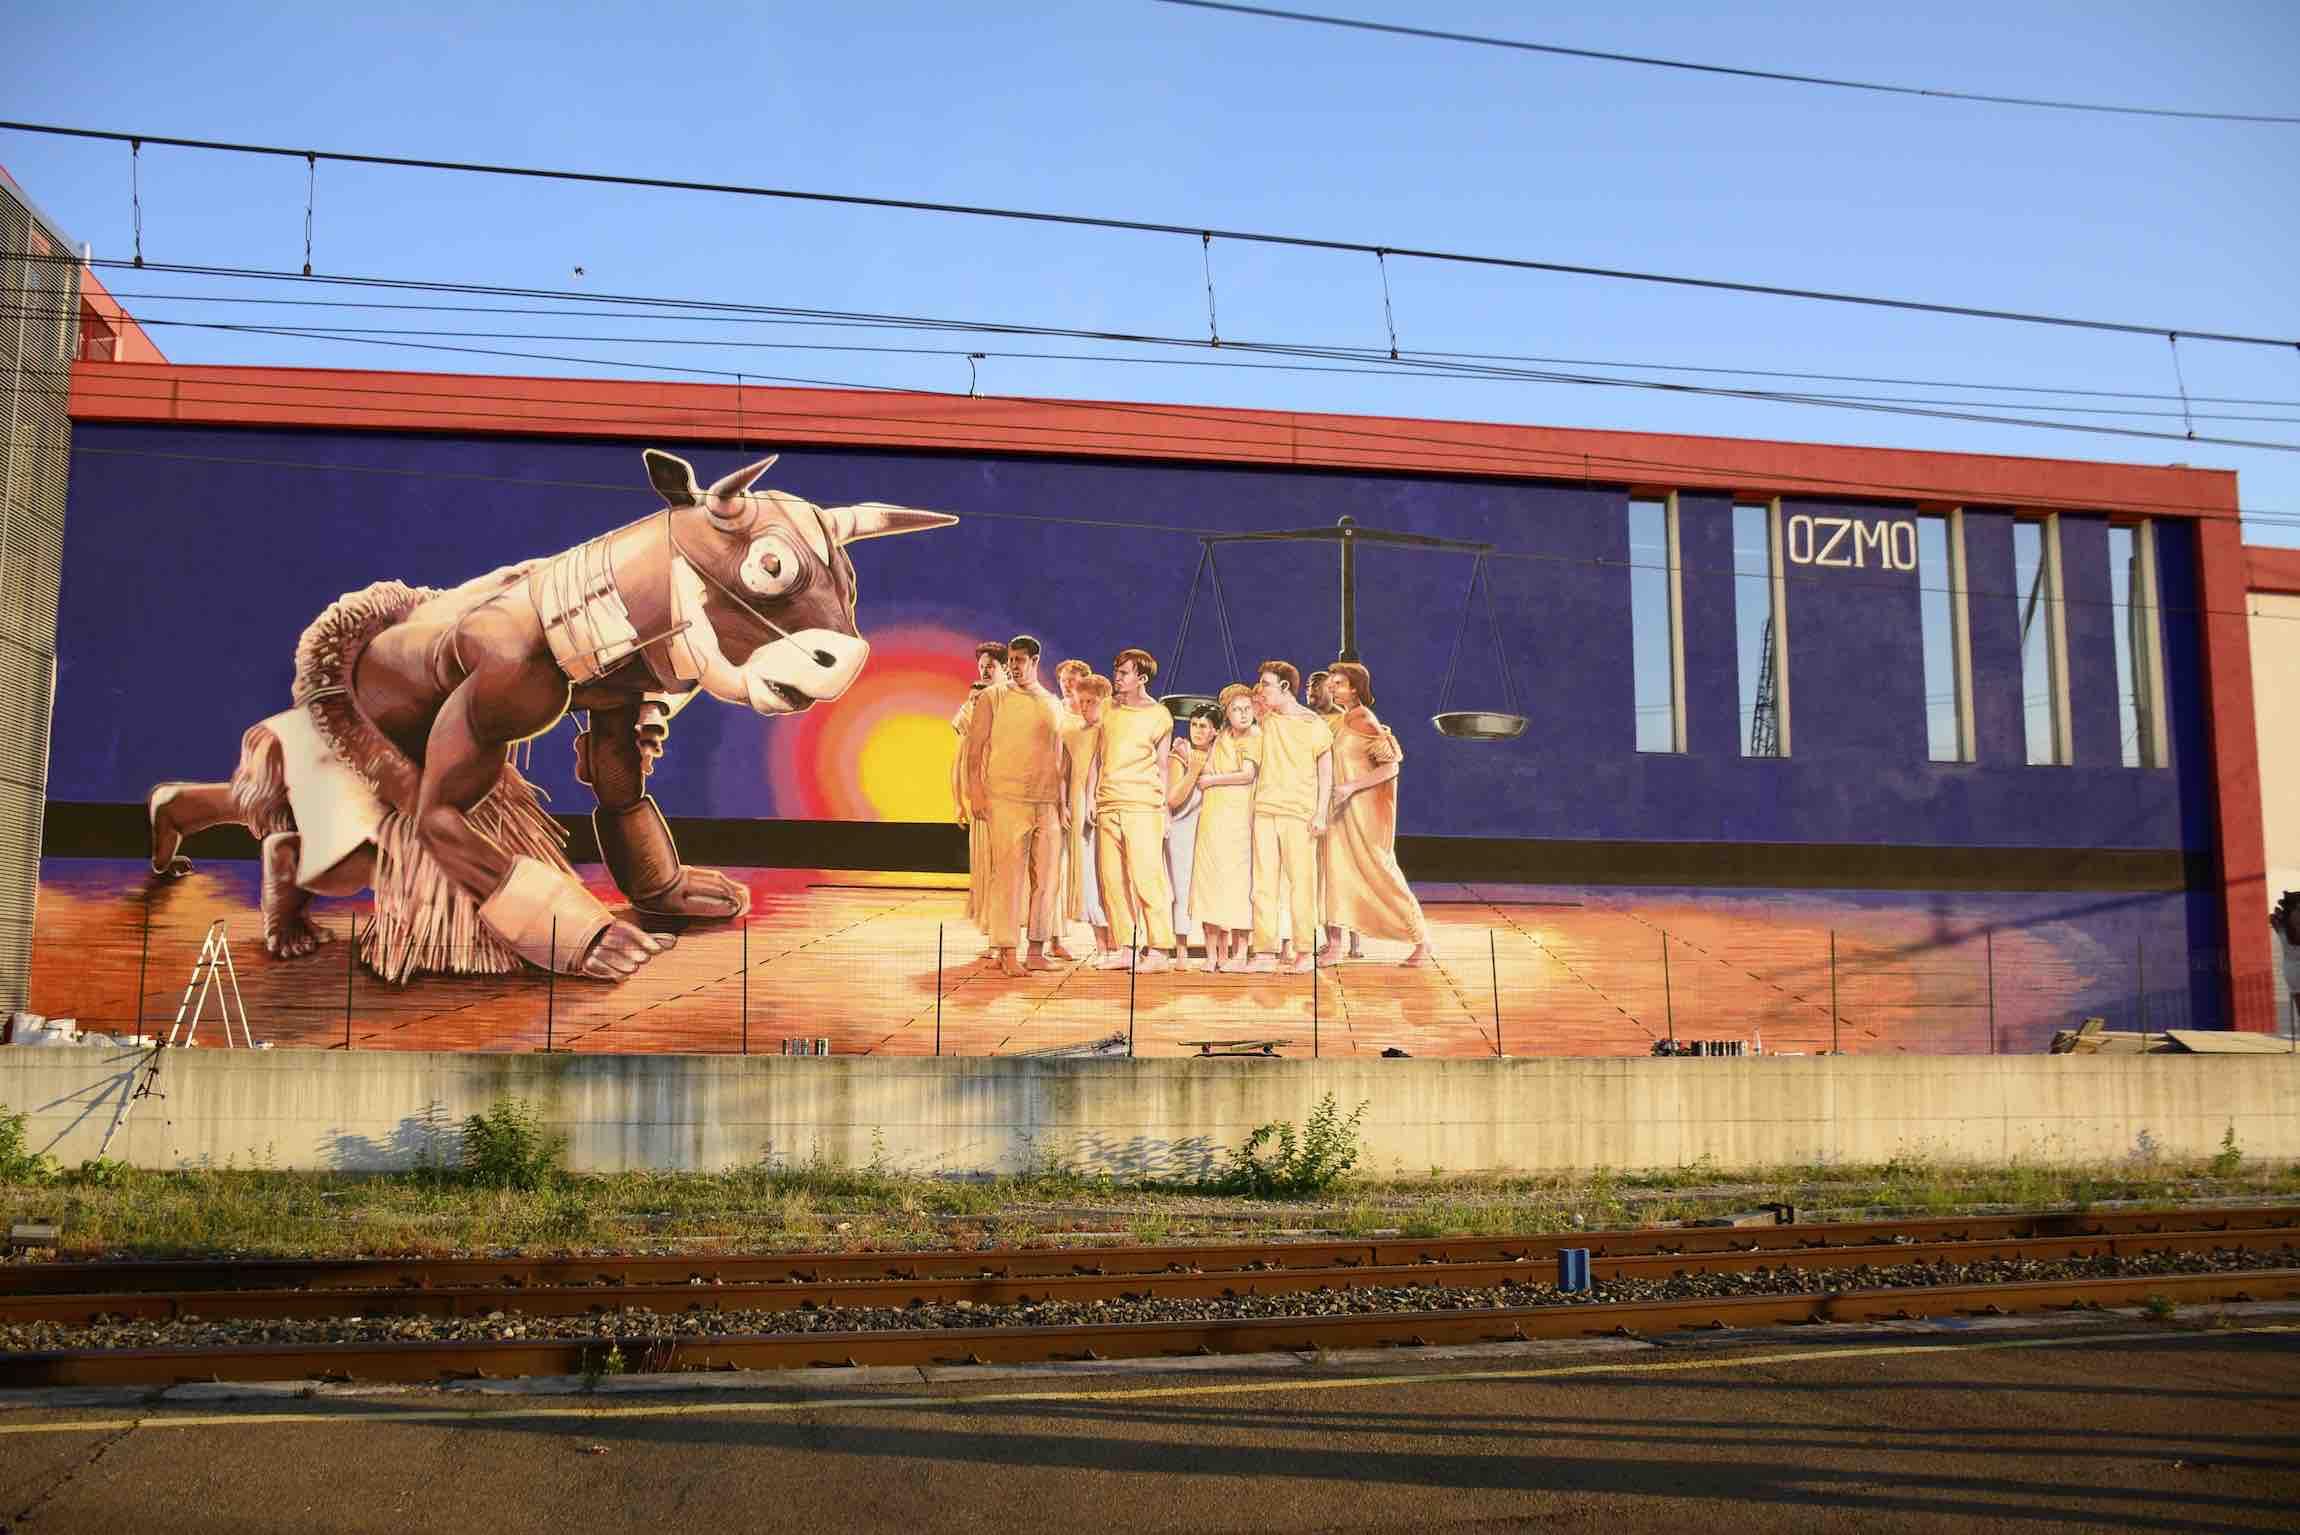 Urban art field - Mani Sporche